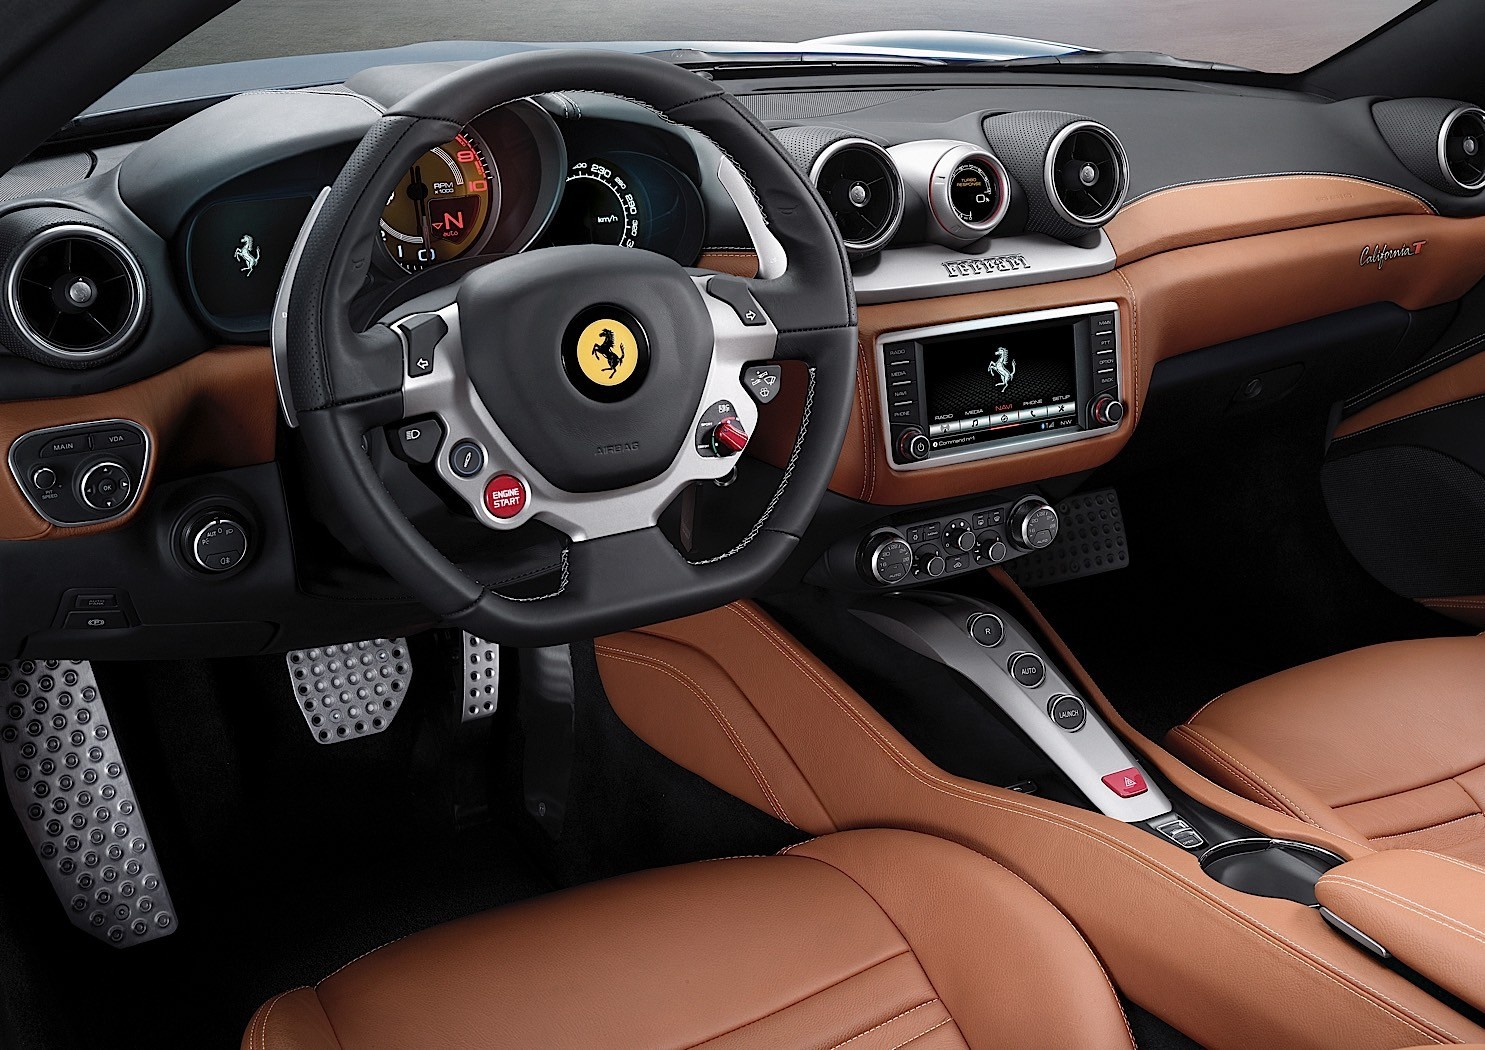 2017 ferrari california t review 56 فراری کالیفرنیا T مدل ۲۰۱۷ نقد و بررسی   اجاره ماشین